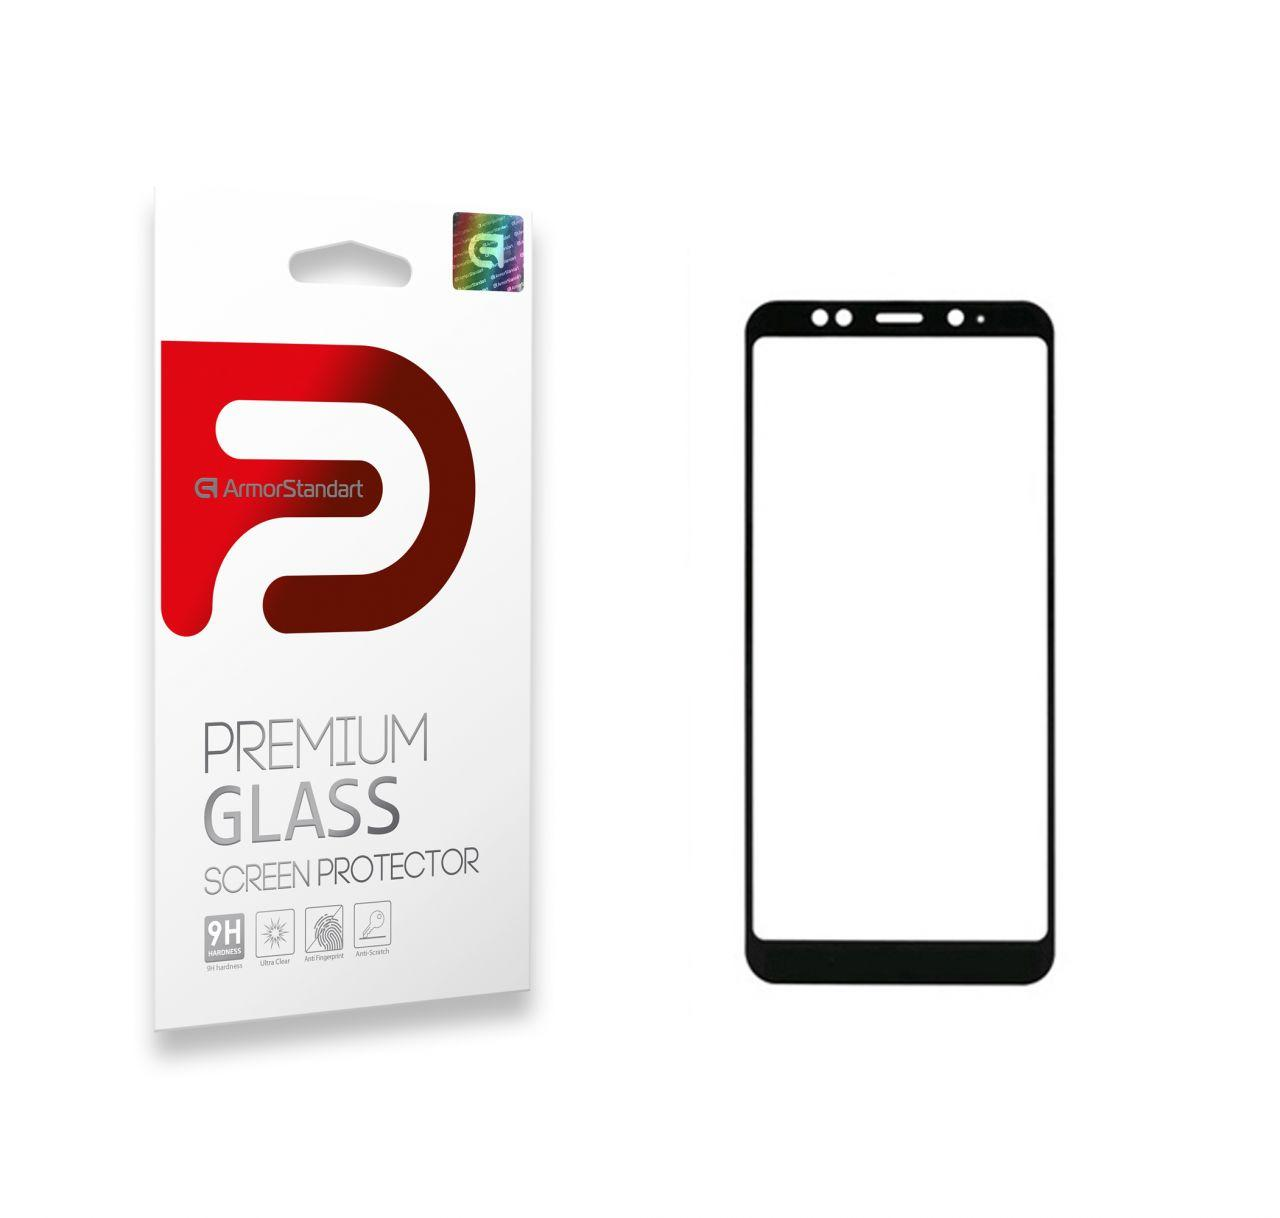 Защитное стекло ArmorStandart Full Cover Full Glue Xiaomi Mi 6X, Mi A2 Black (ARM52482-GFG-BK)